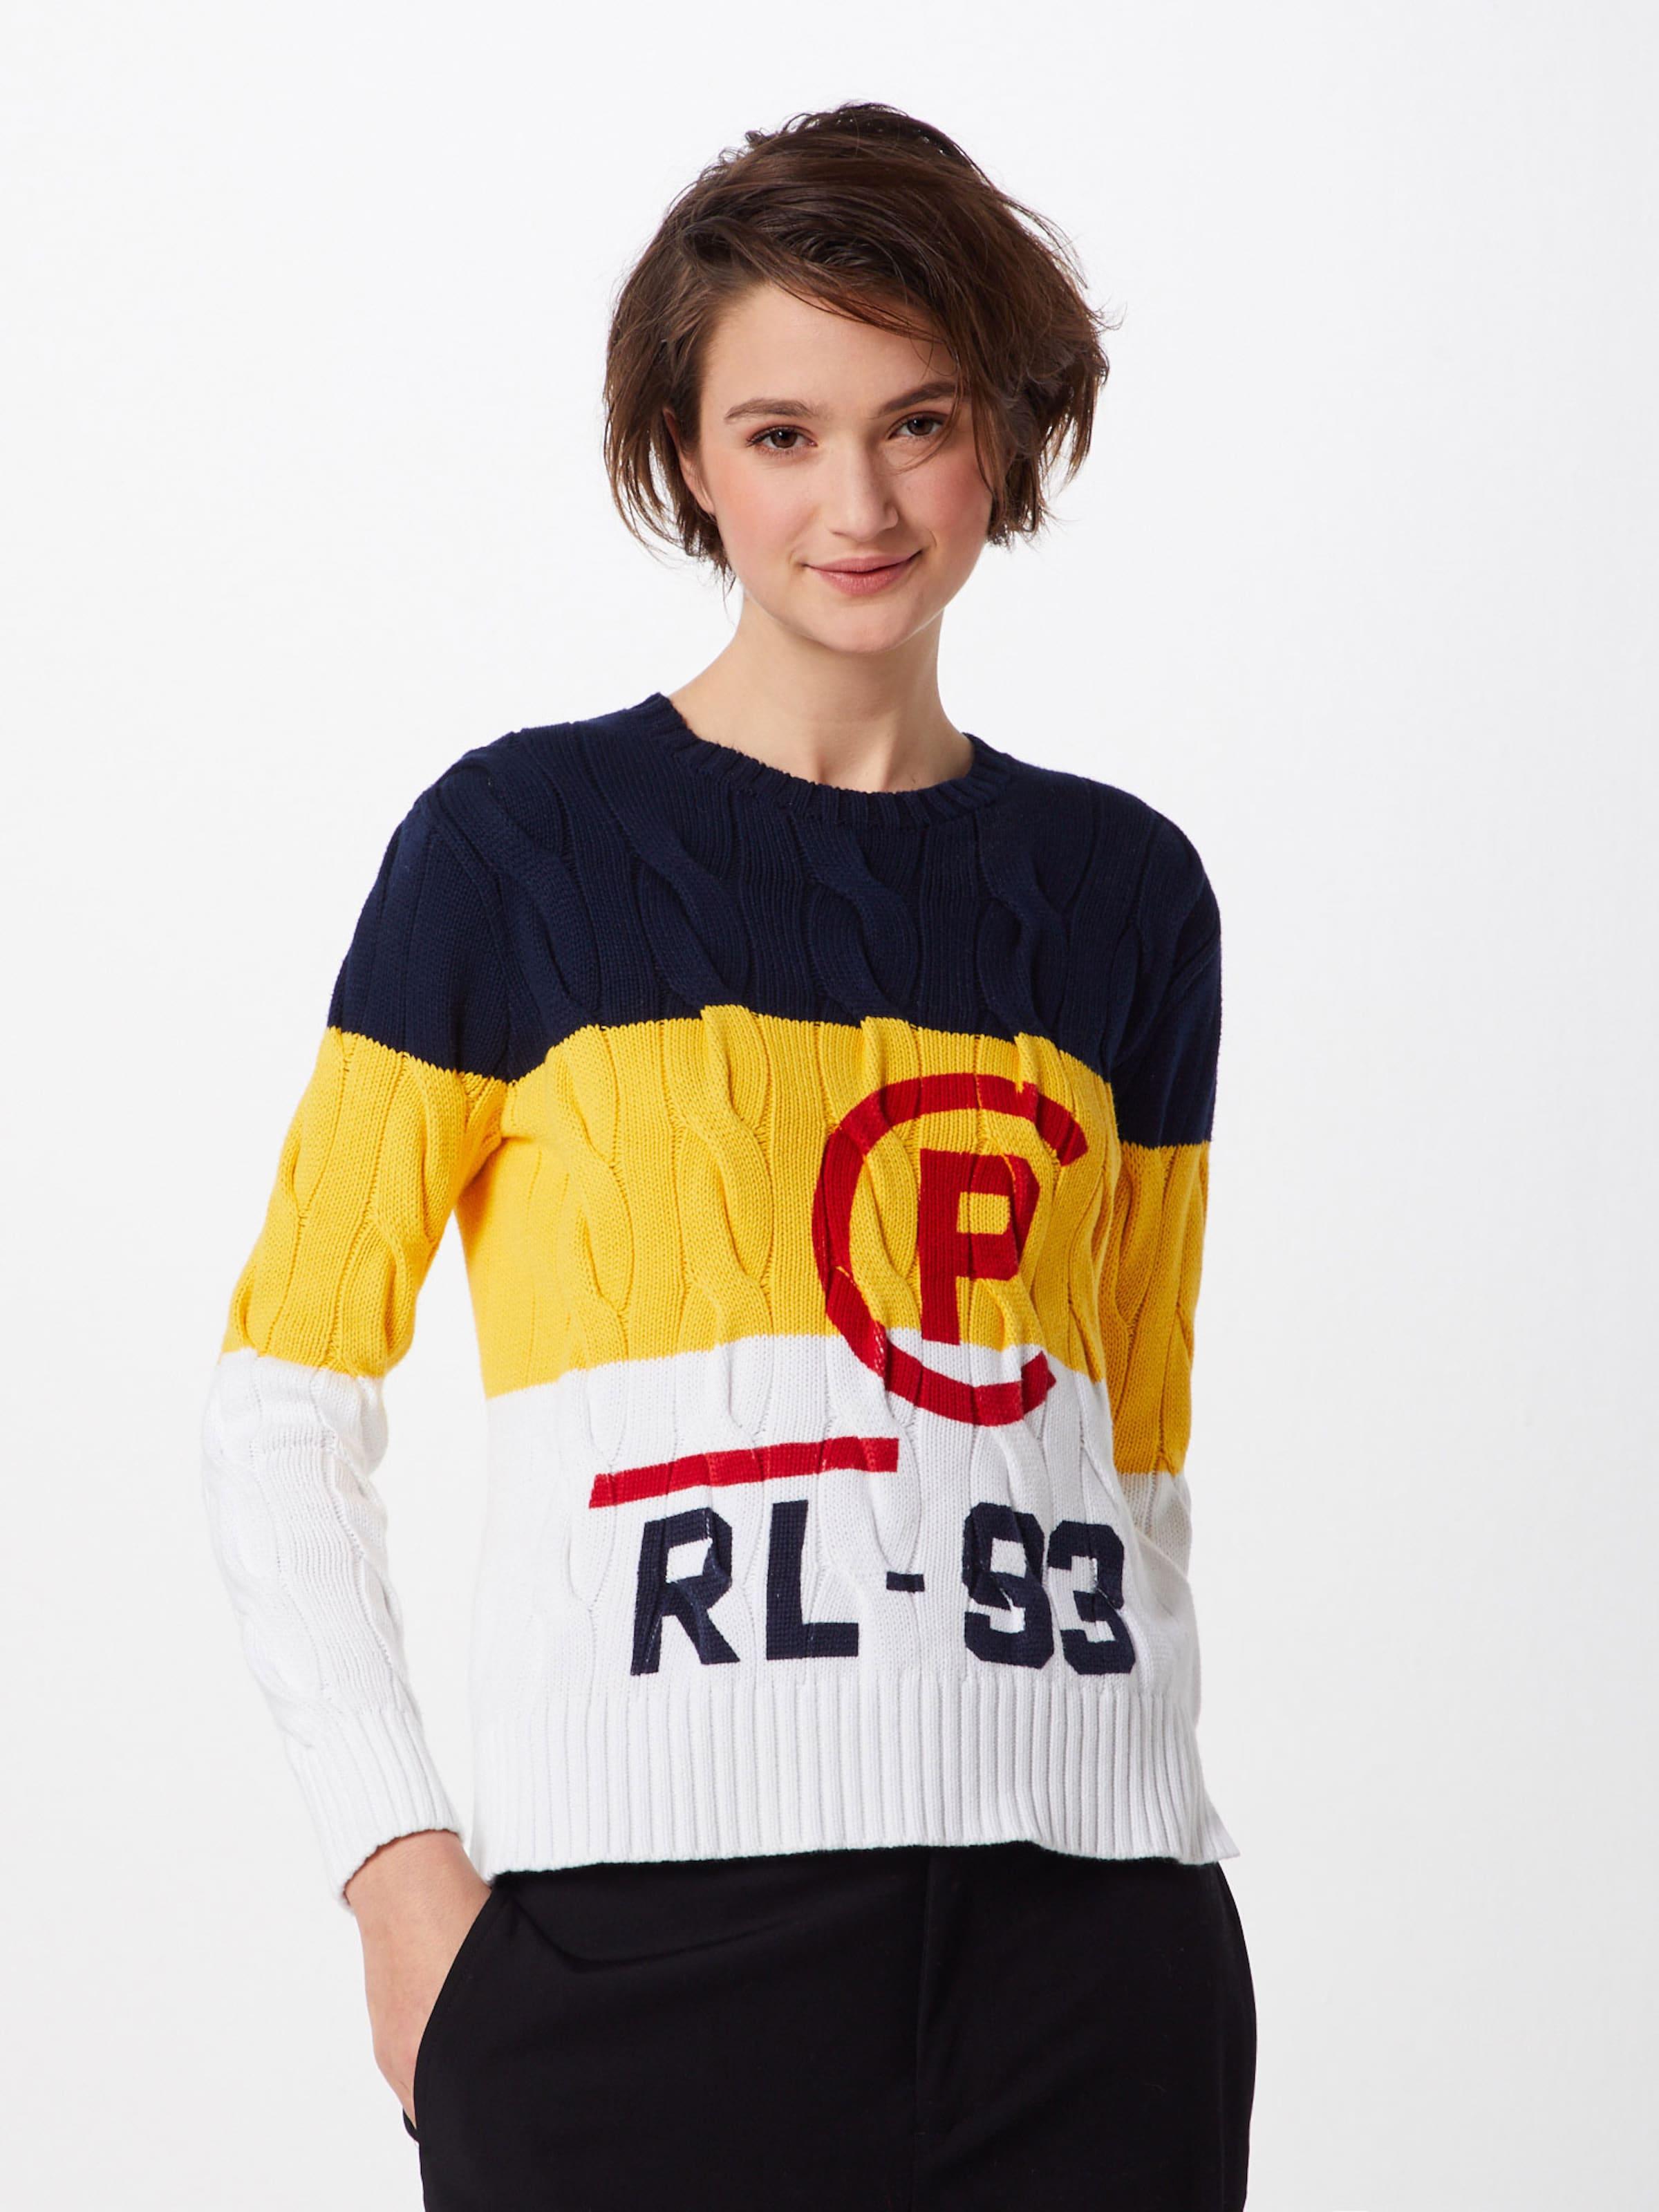 Lauren over Blanc MarineJaune En Bleu Rouge Pull Polo Ralph tsordQhCxB